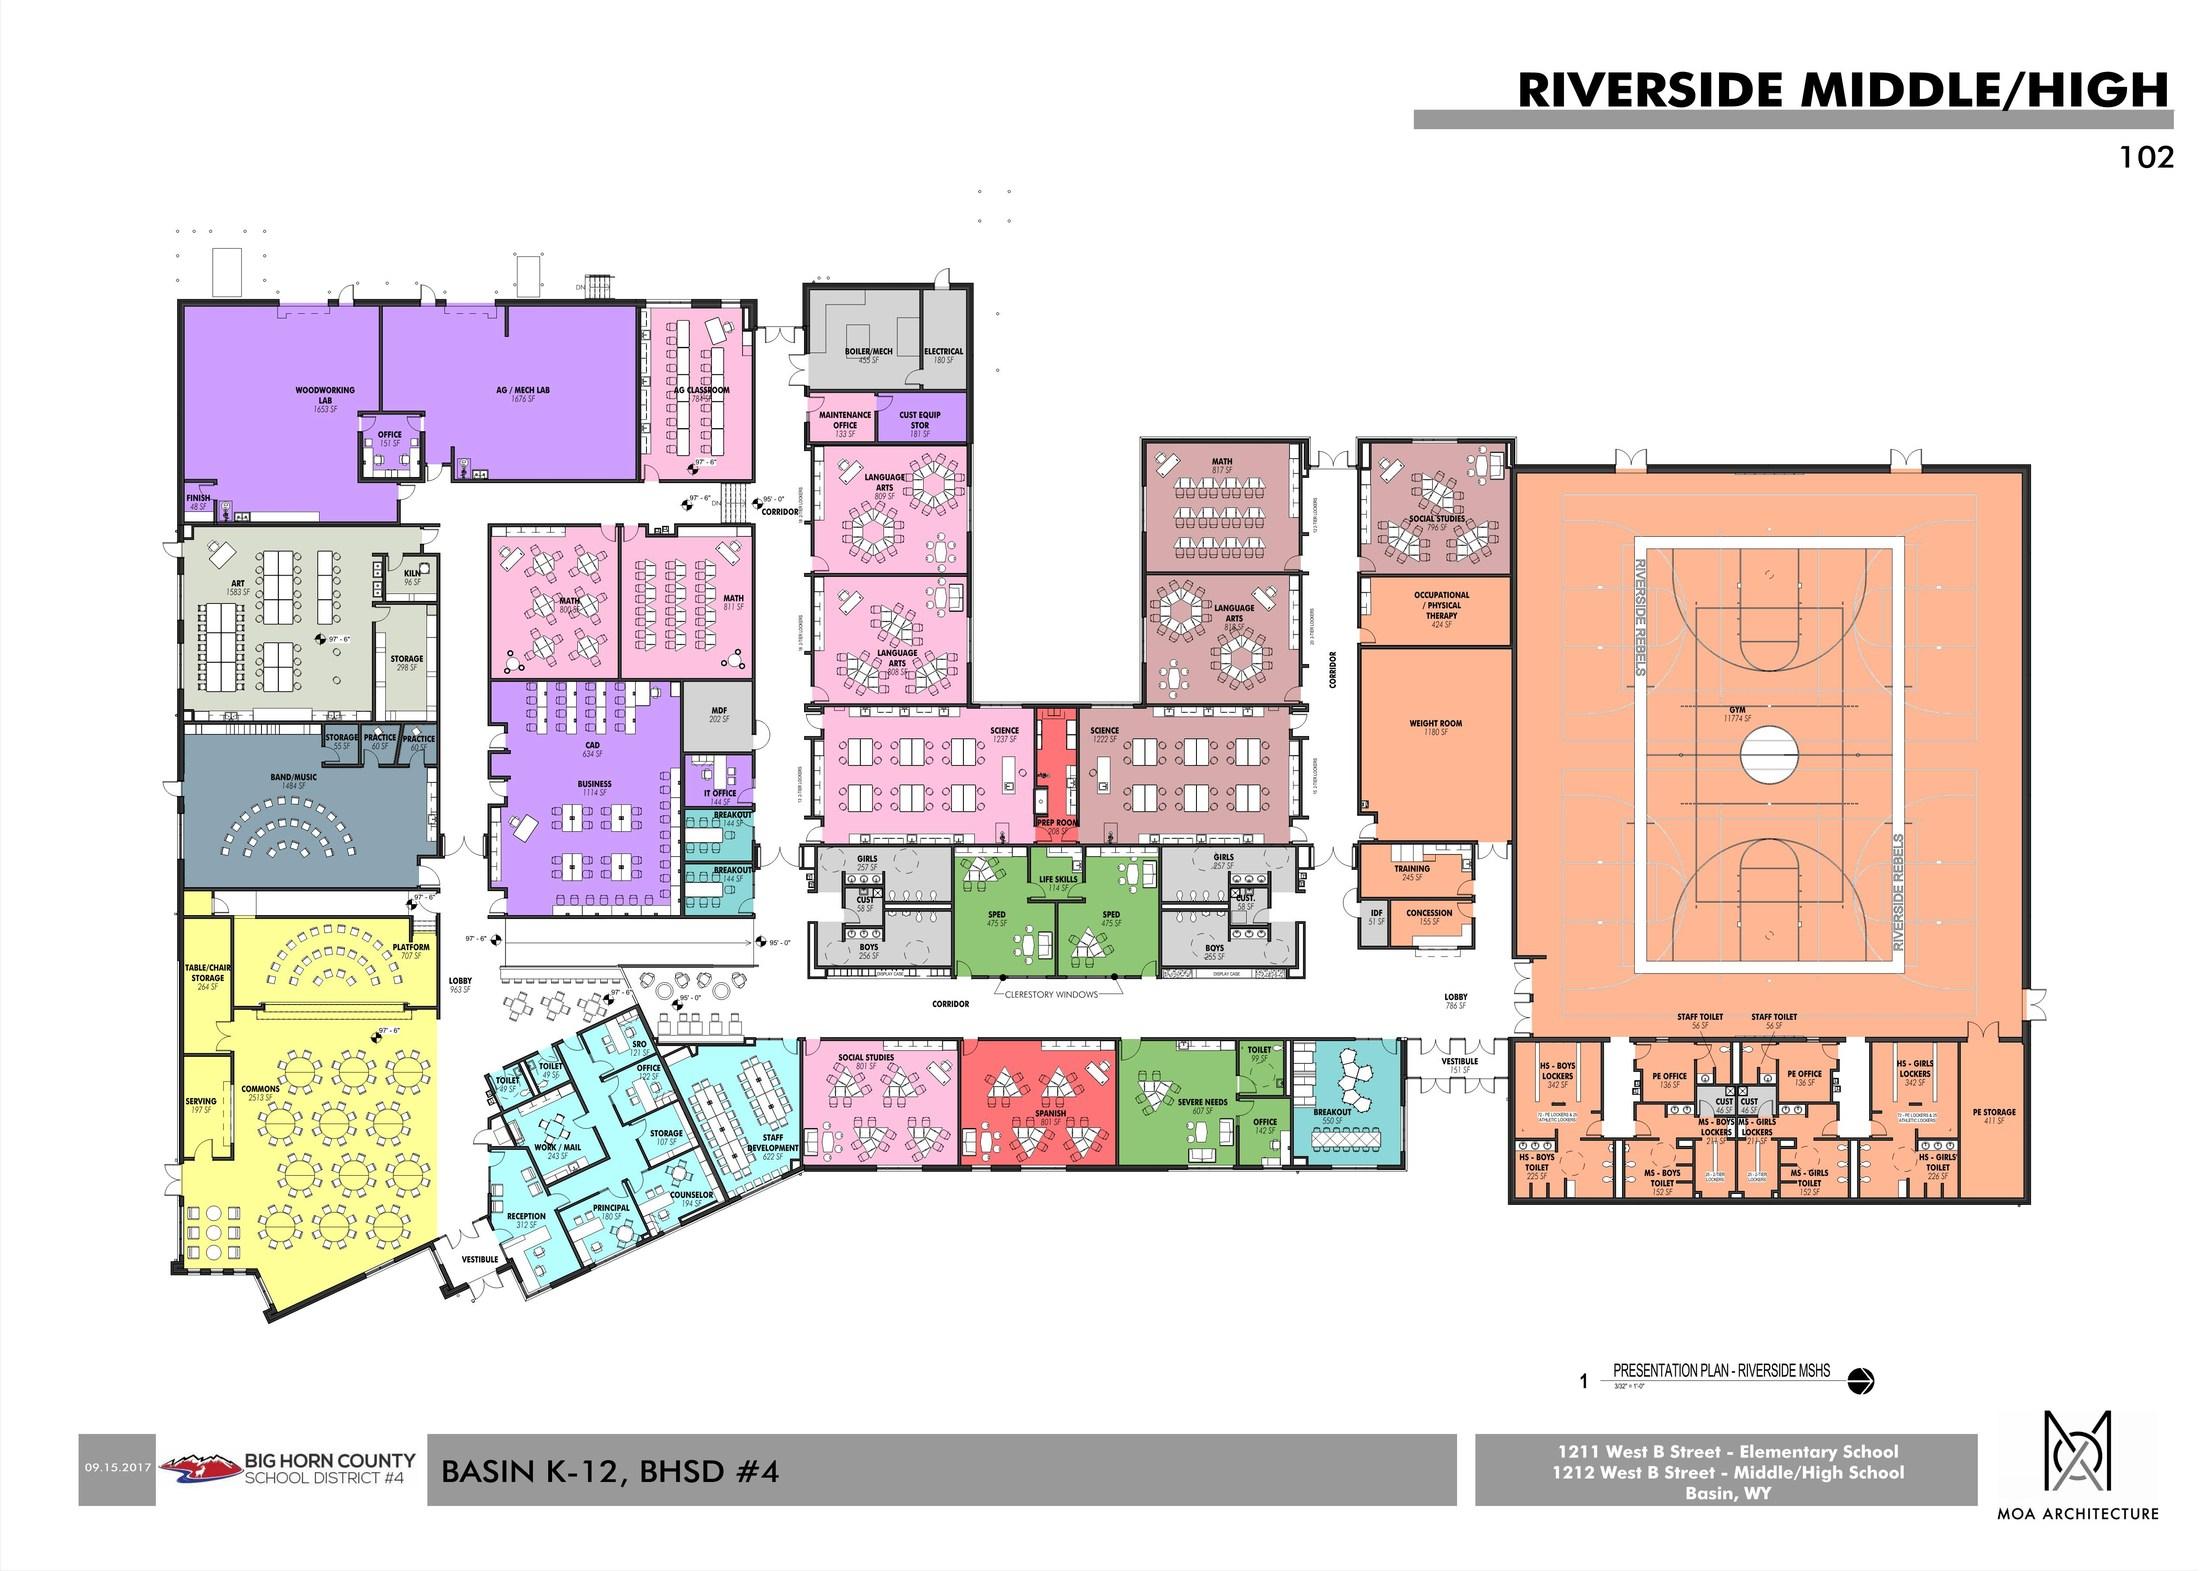 Riverside Middle/High